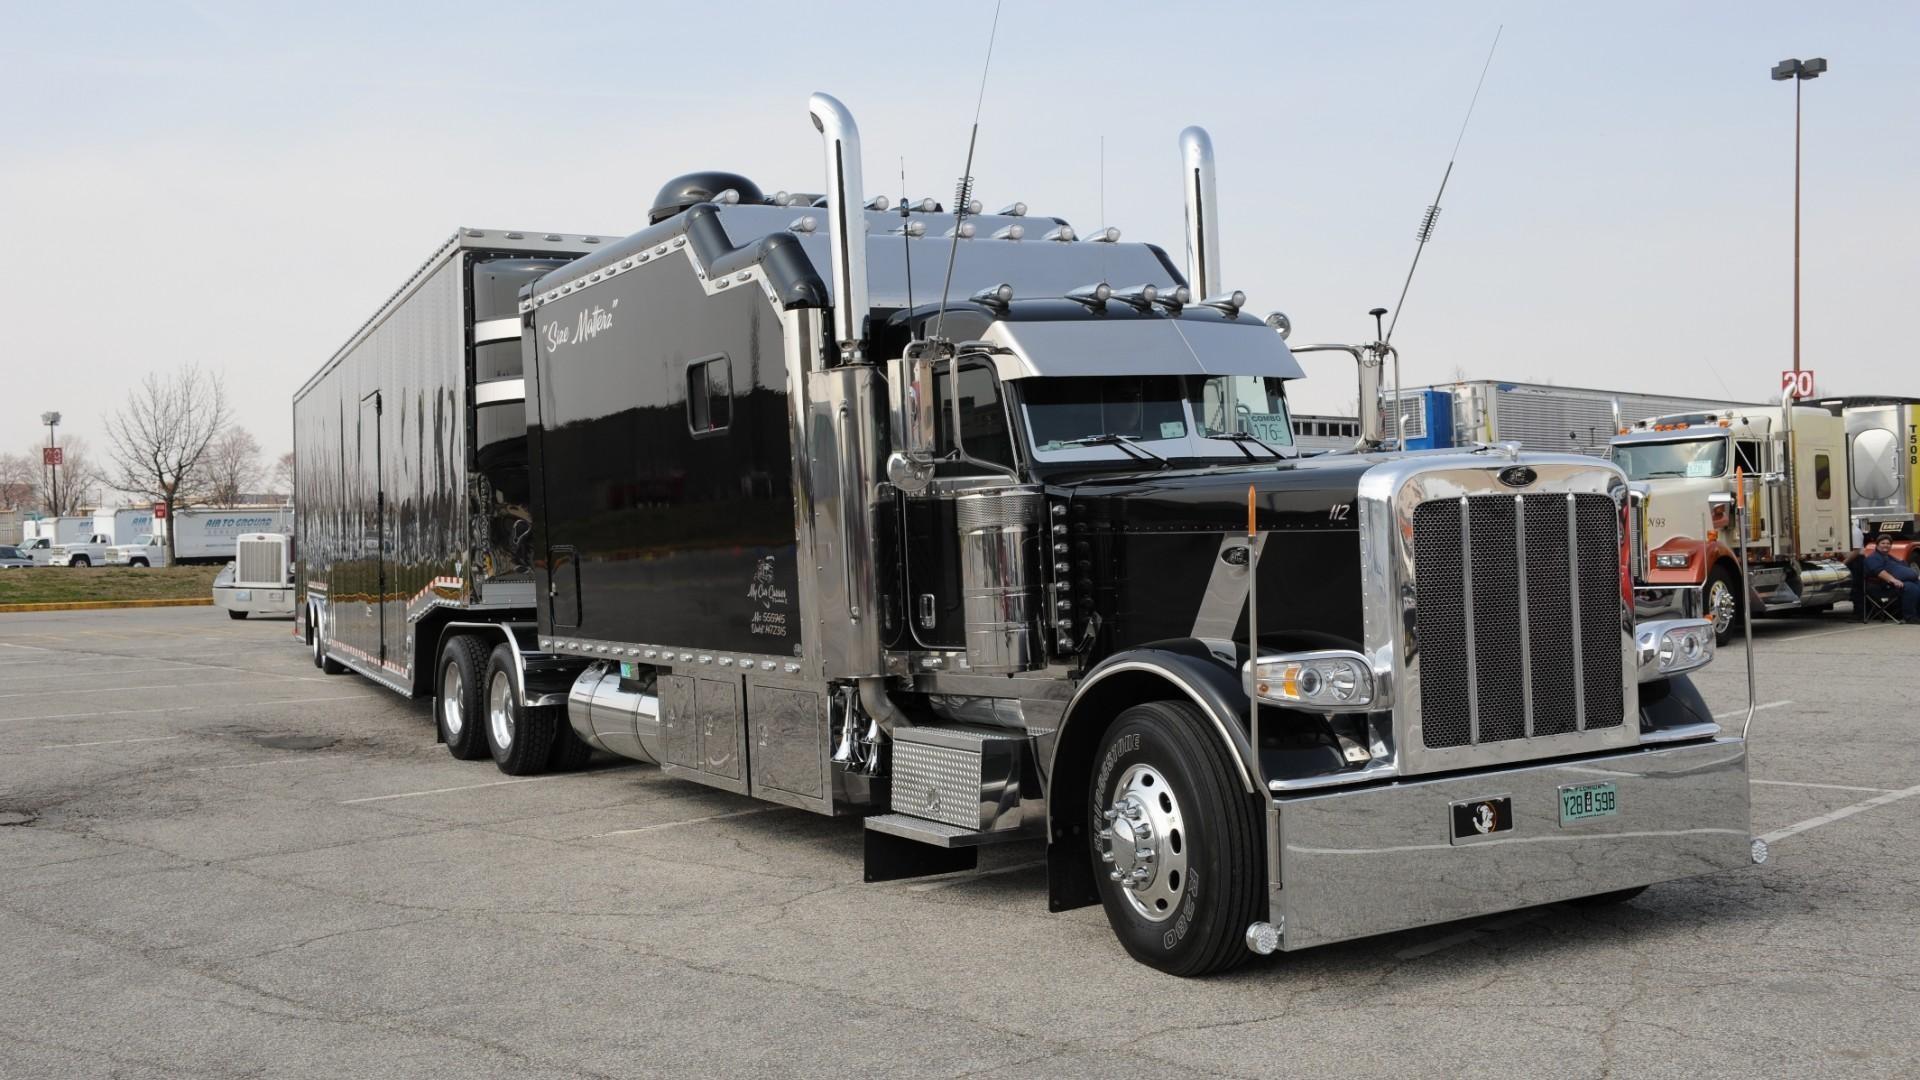 wallpaper.wiki-HD-Semi-Truck-Backgrounds-PIC-WPE006917